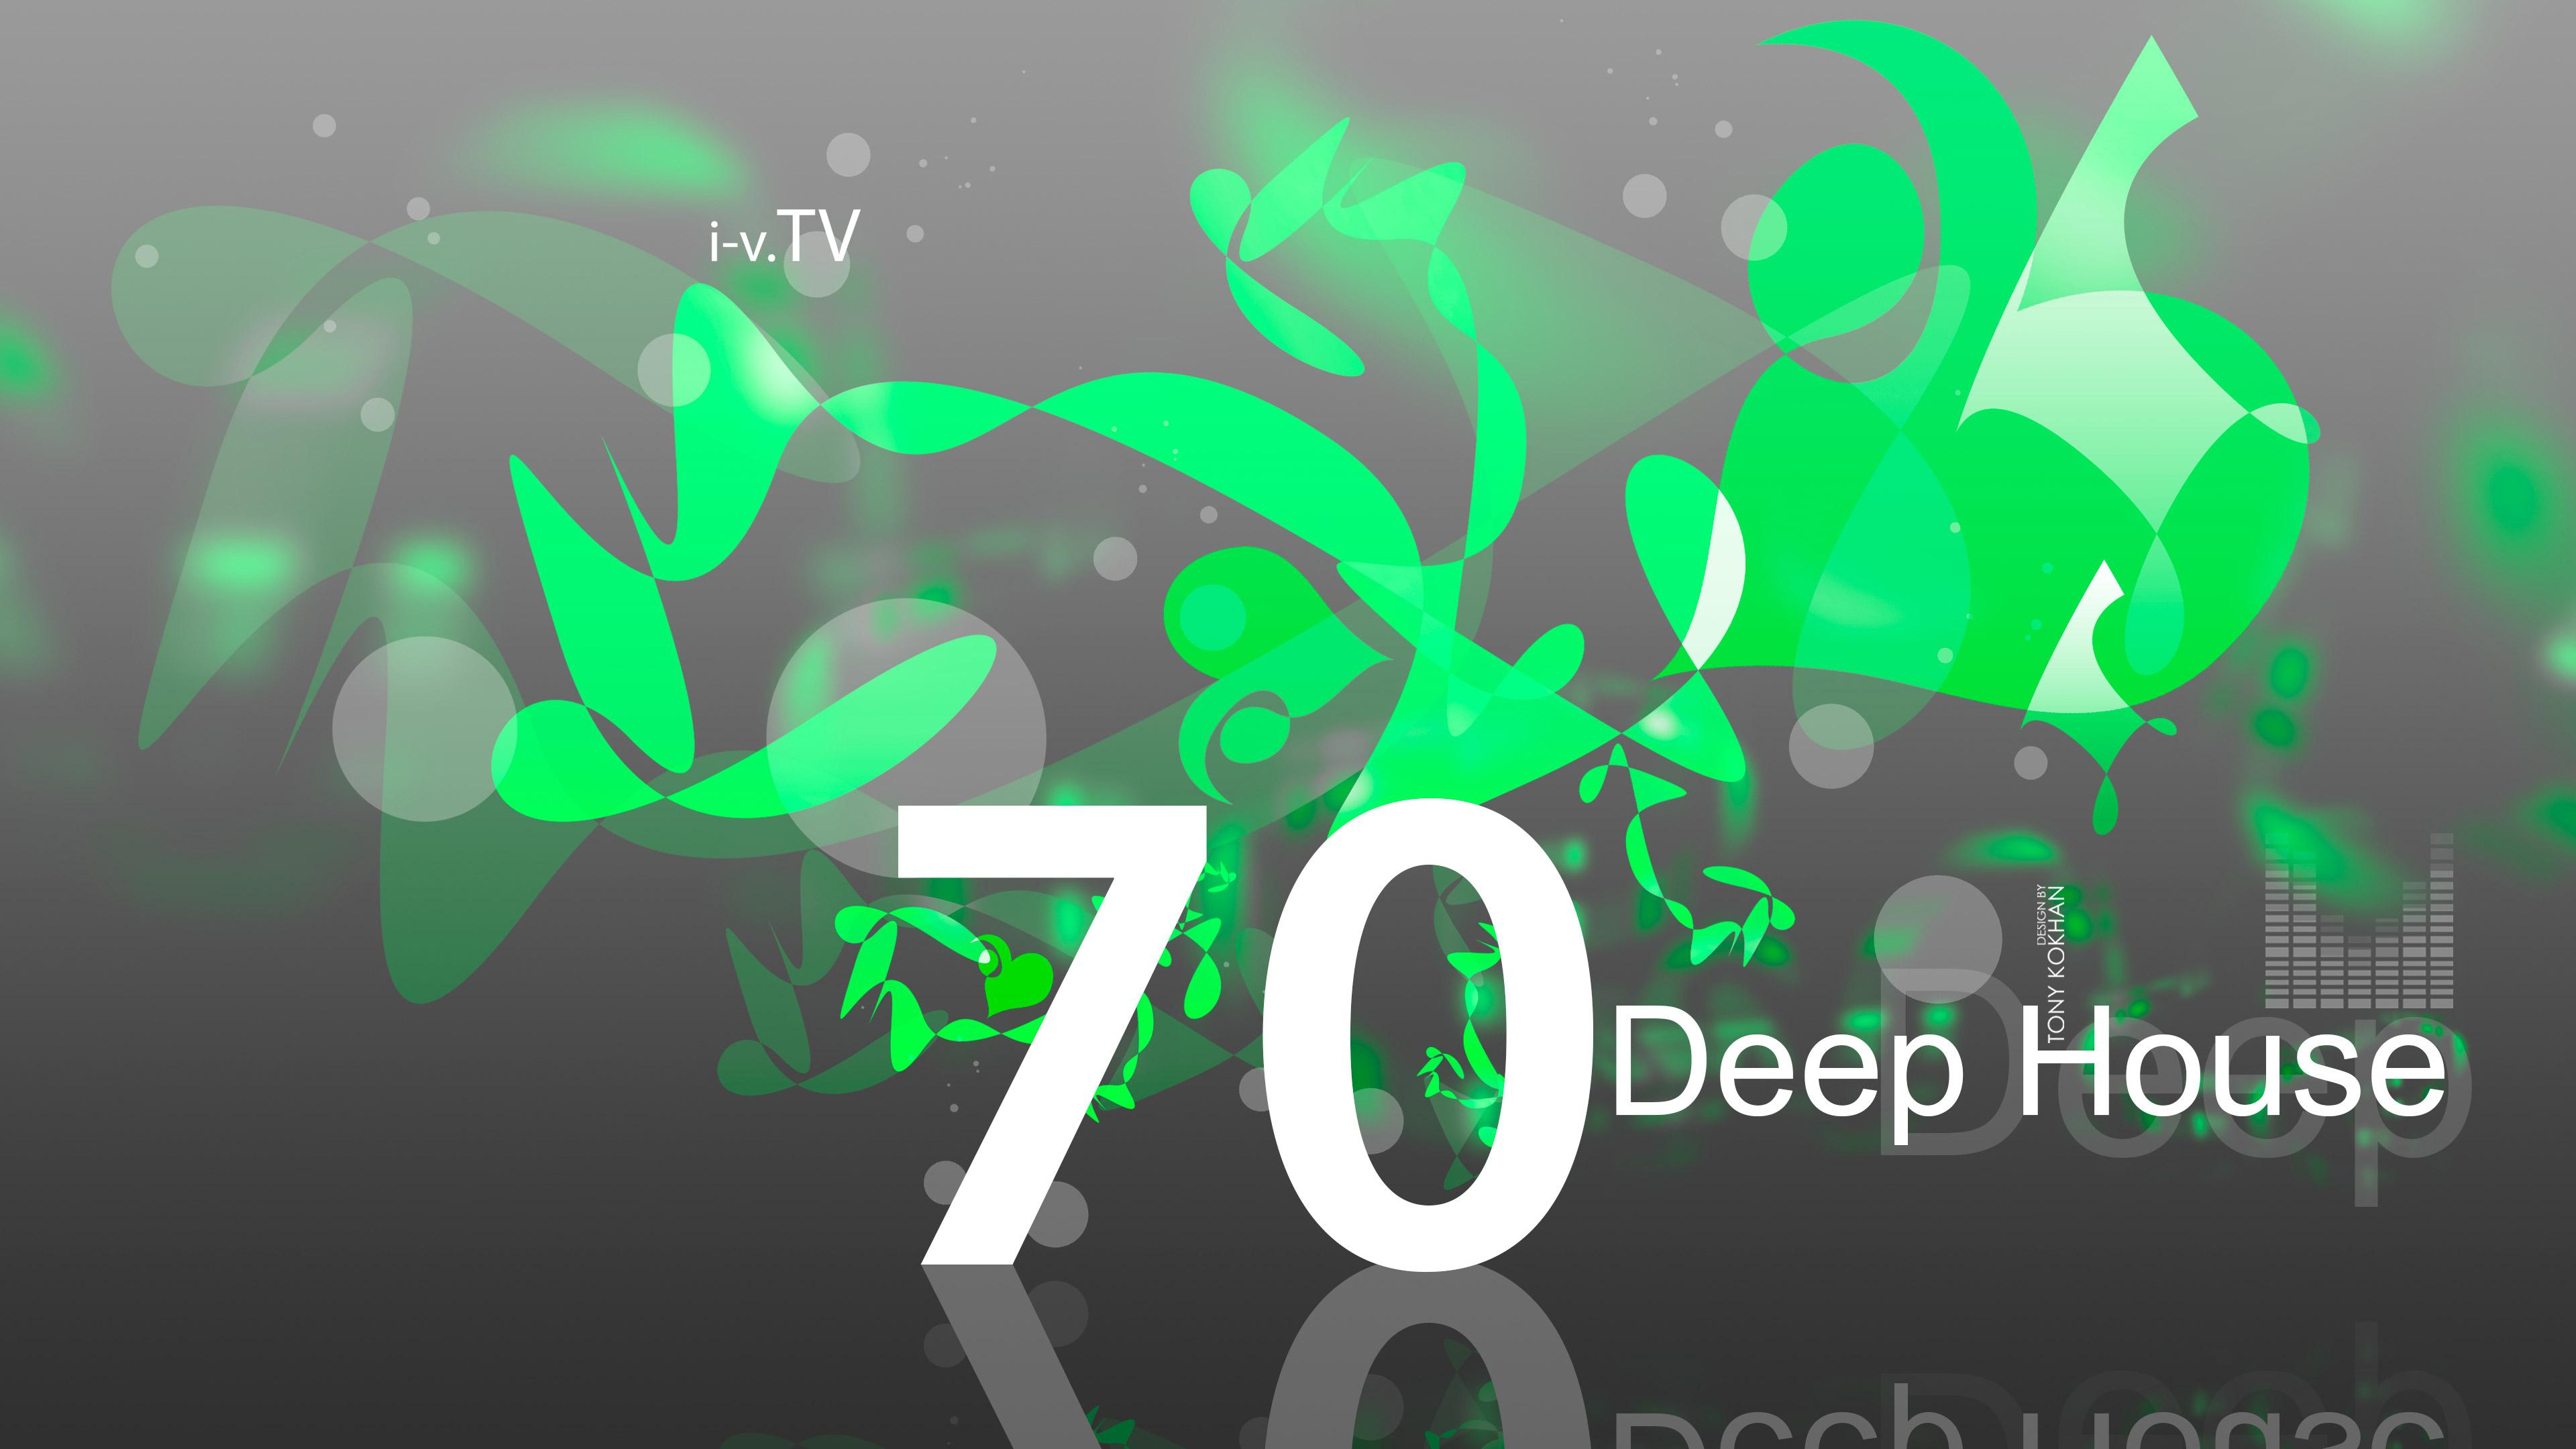 Deep House Music eQ SC Seventy 2016 Tony Kokhan 4K Sound 3840x2160